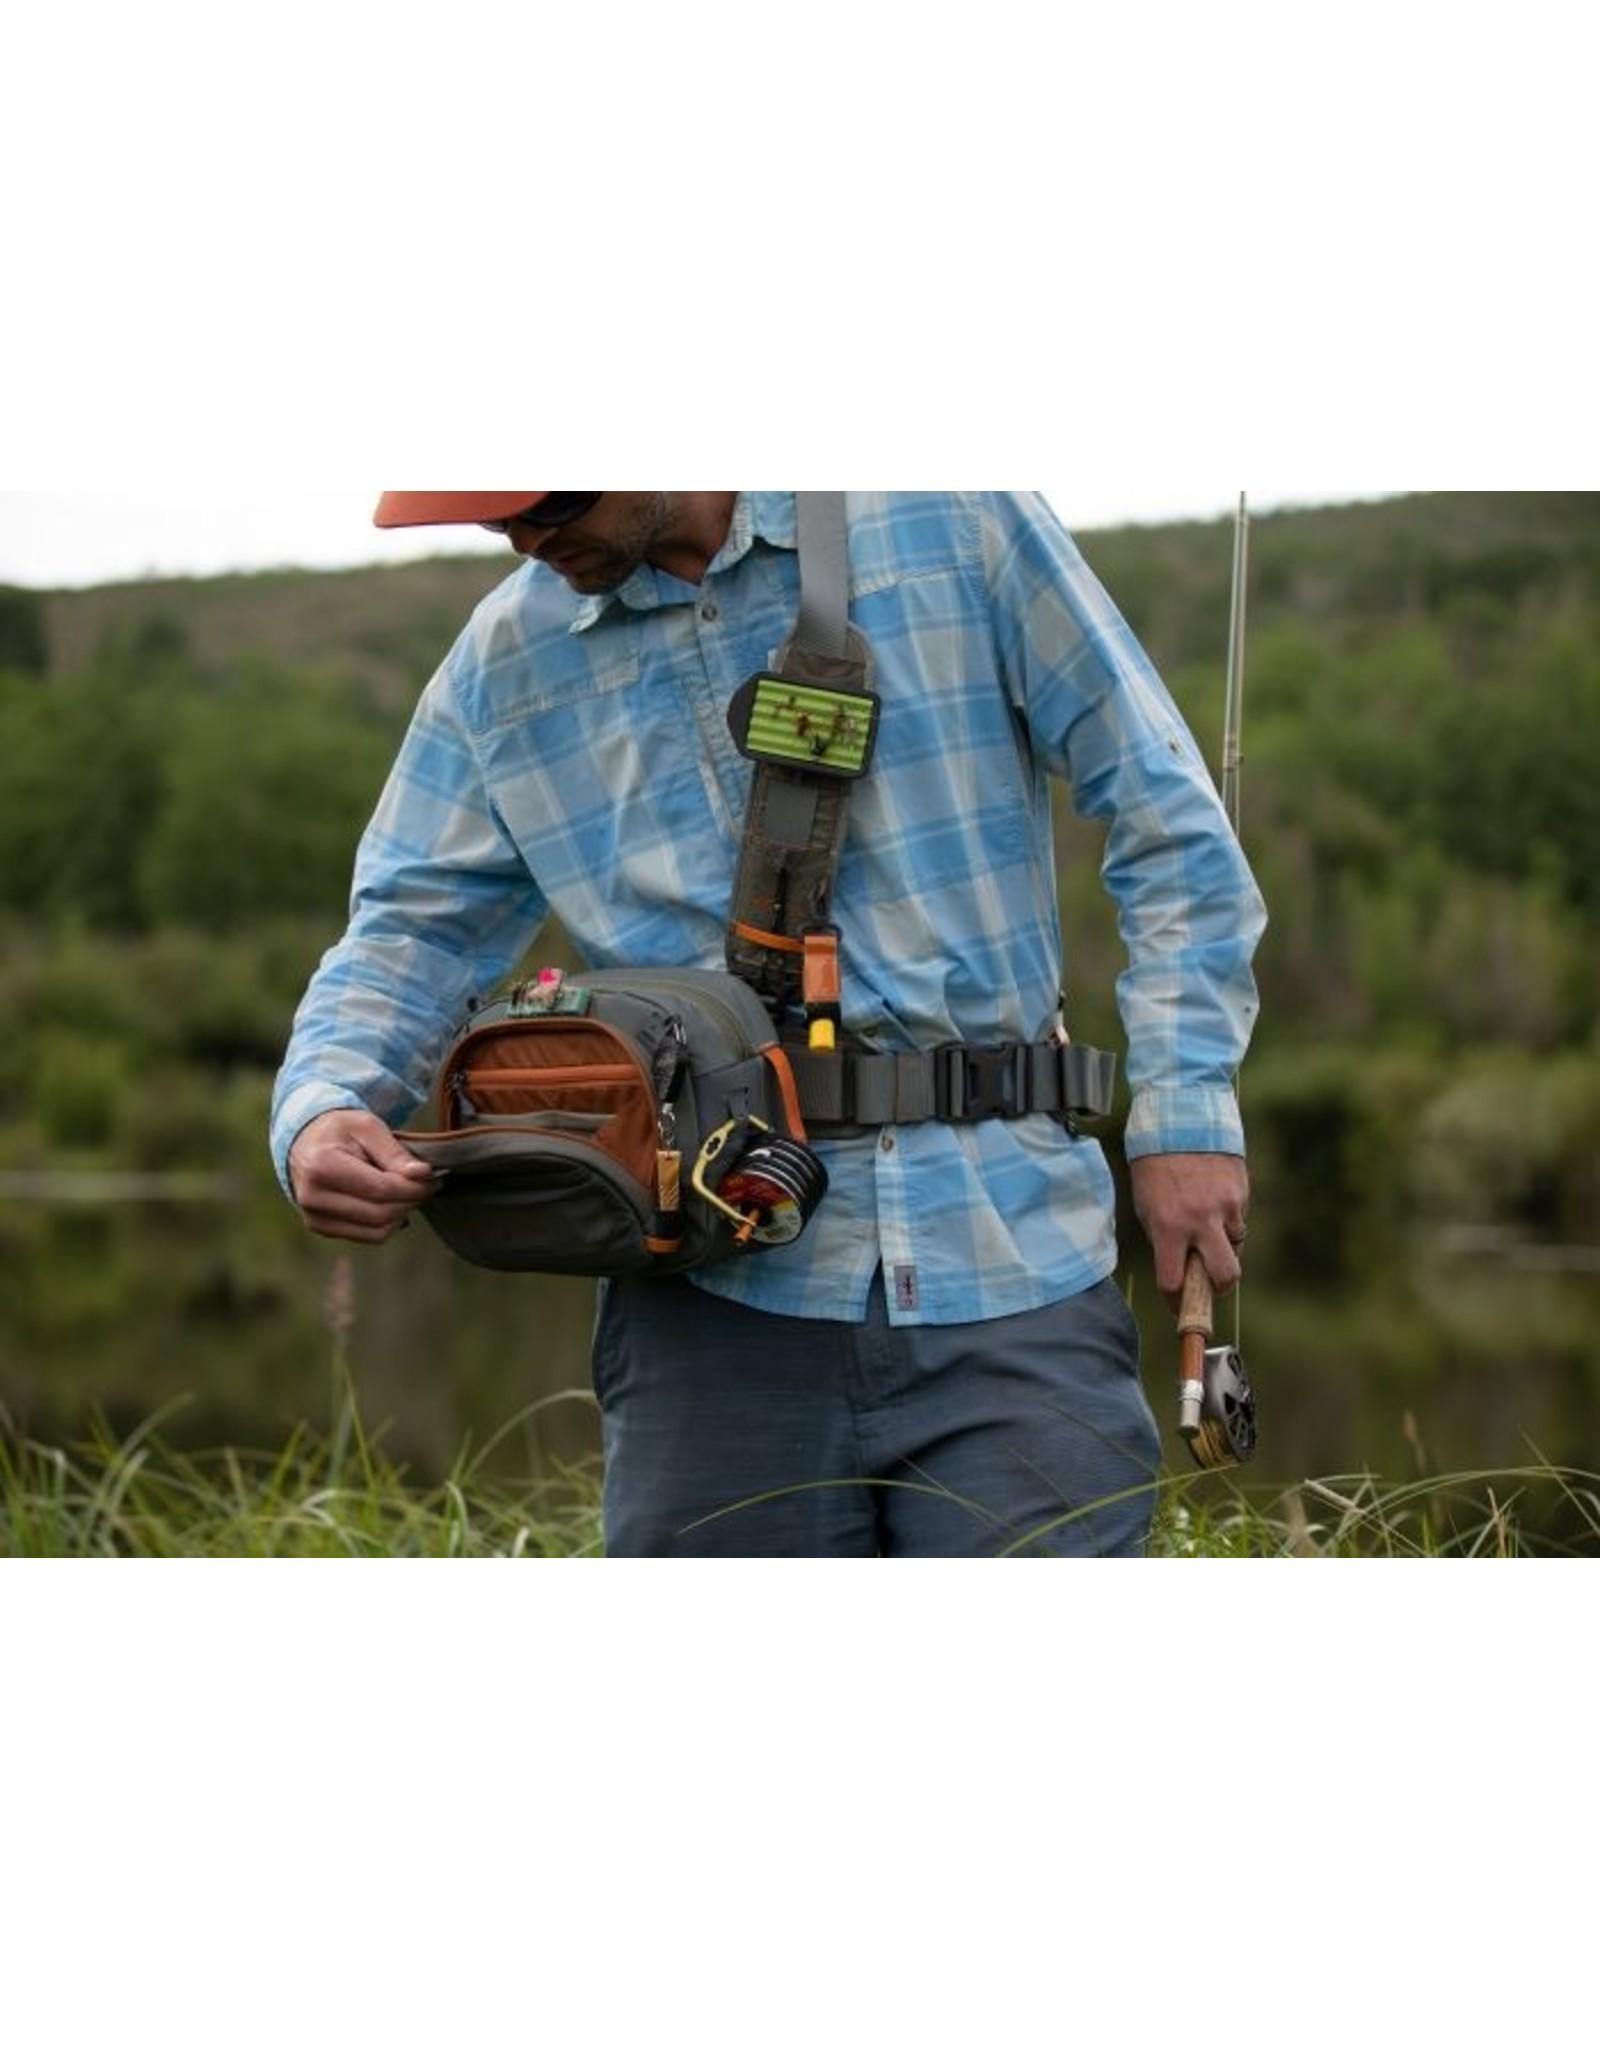 Fishpond Fishpond - SwitchbackPro Wading System